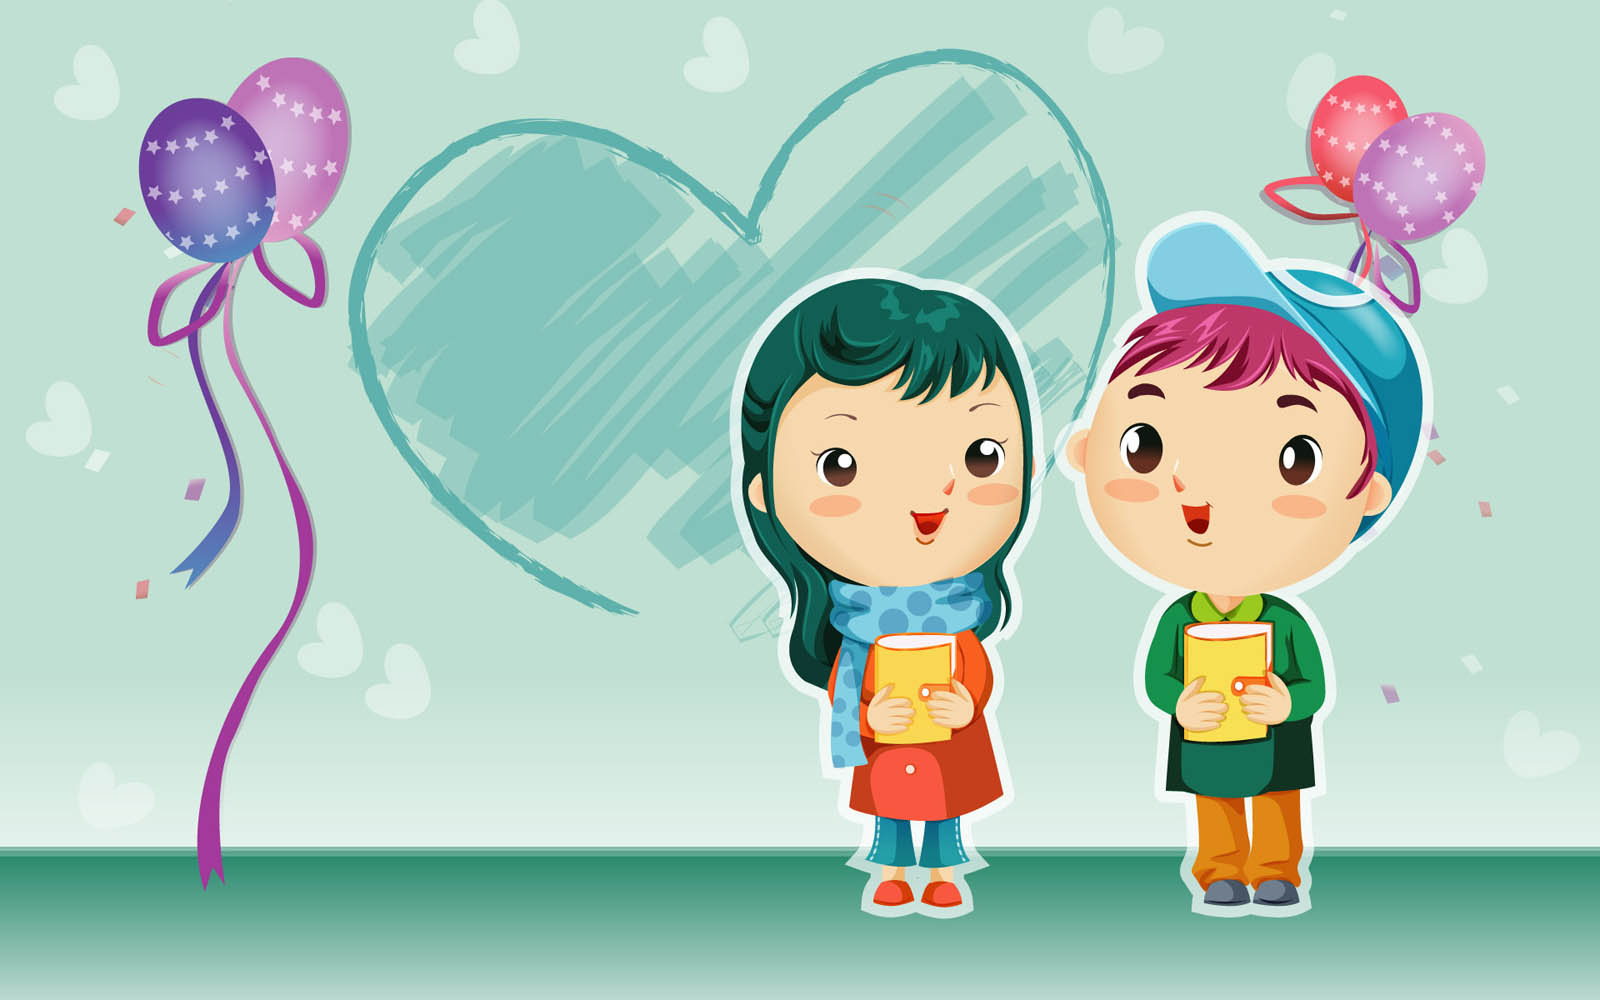 wallpapers: Cartoon Love Wallpapers